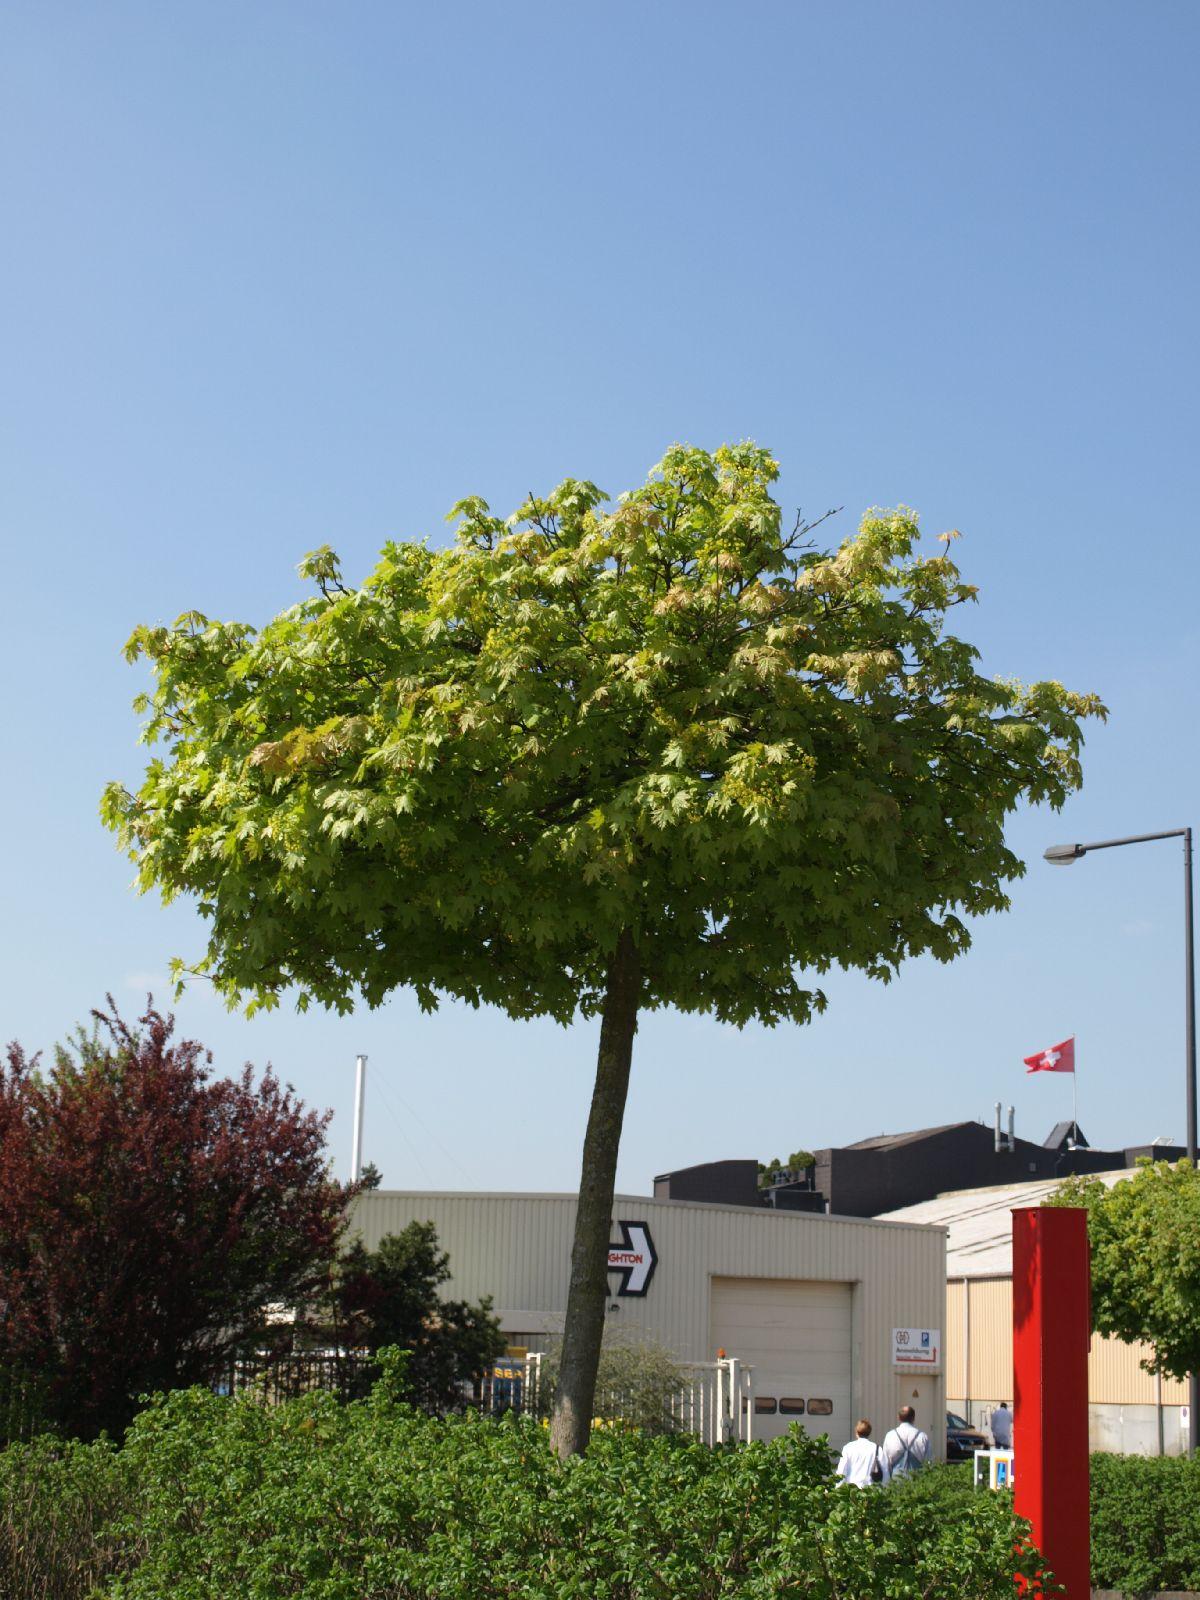 Plants-Trees_Photo_Texture_B_P4212540